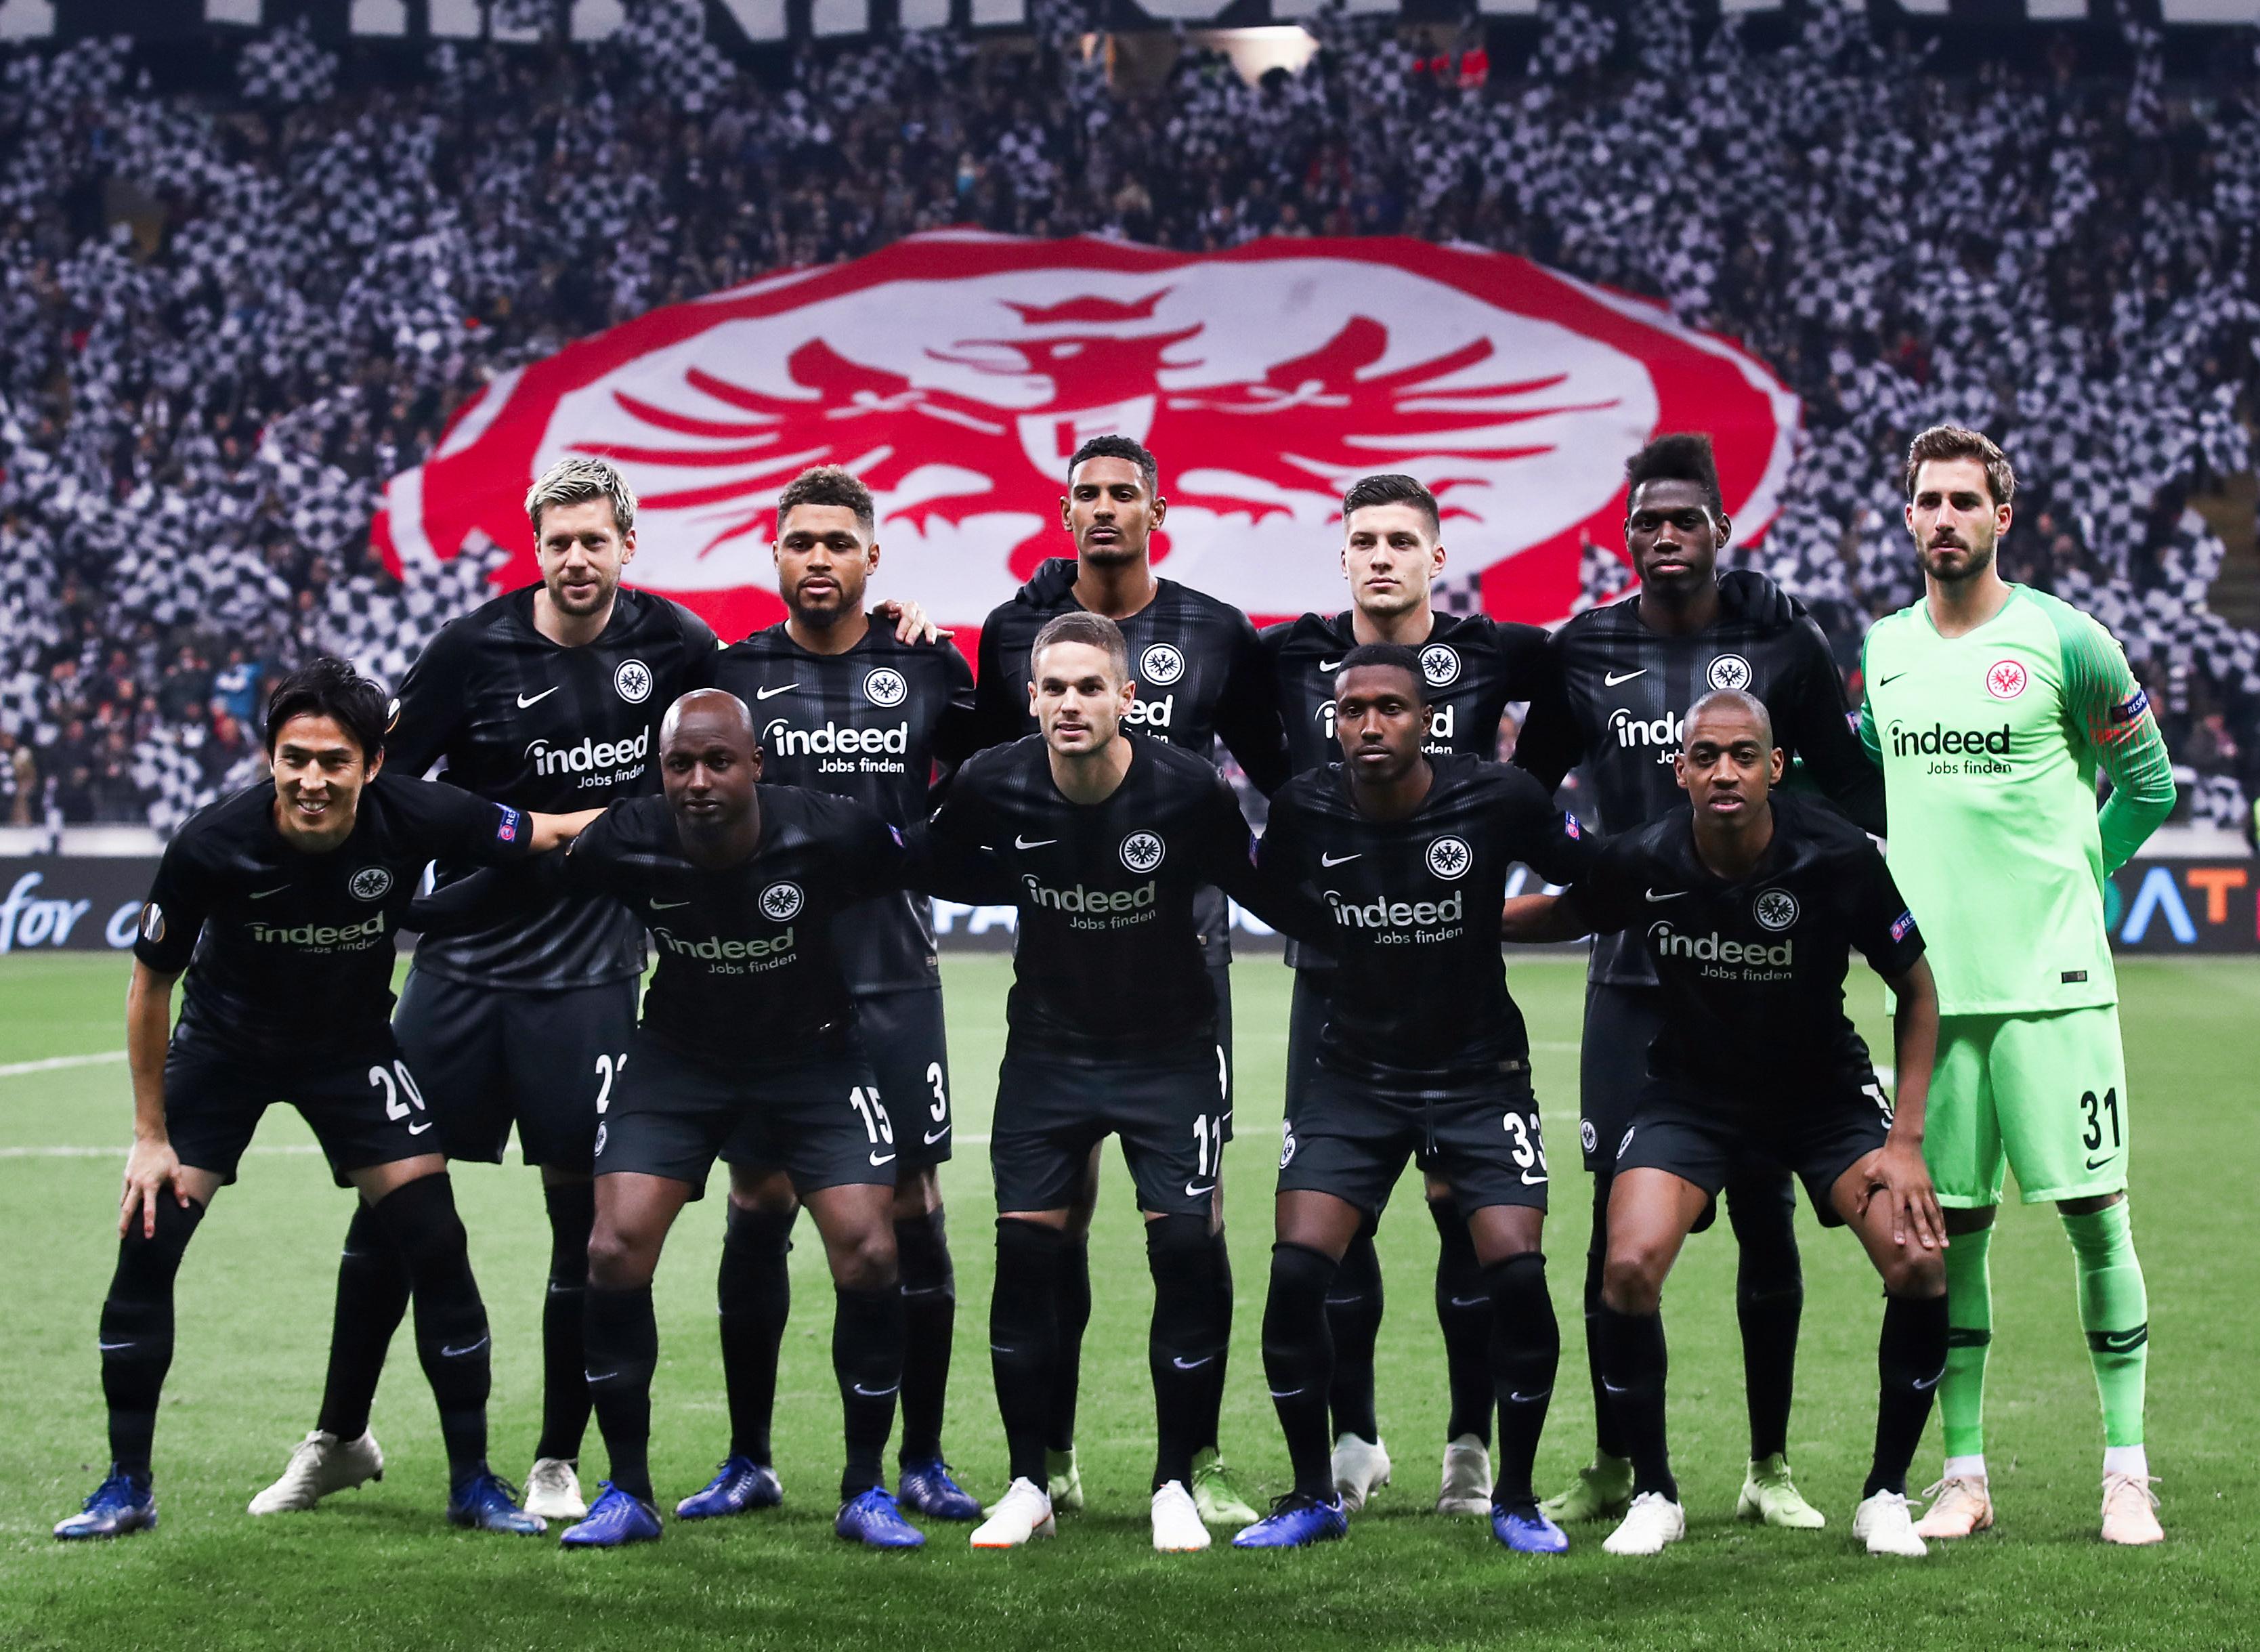 Pertandingan Bola Eintracht Frankfurt vs SC Freiburg